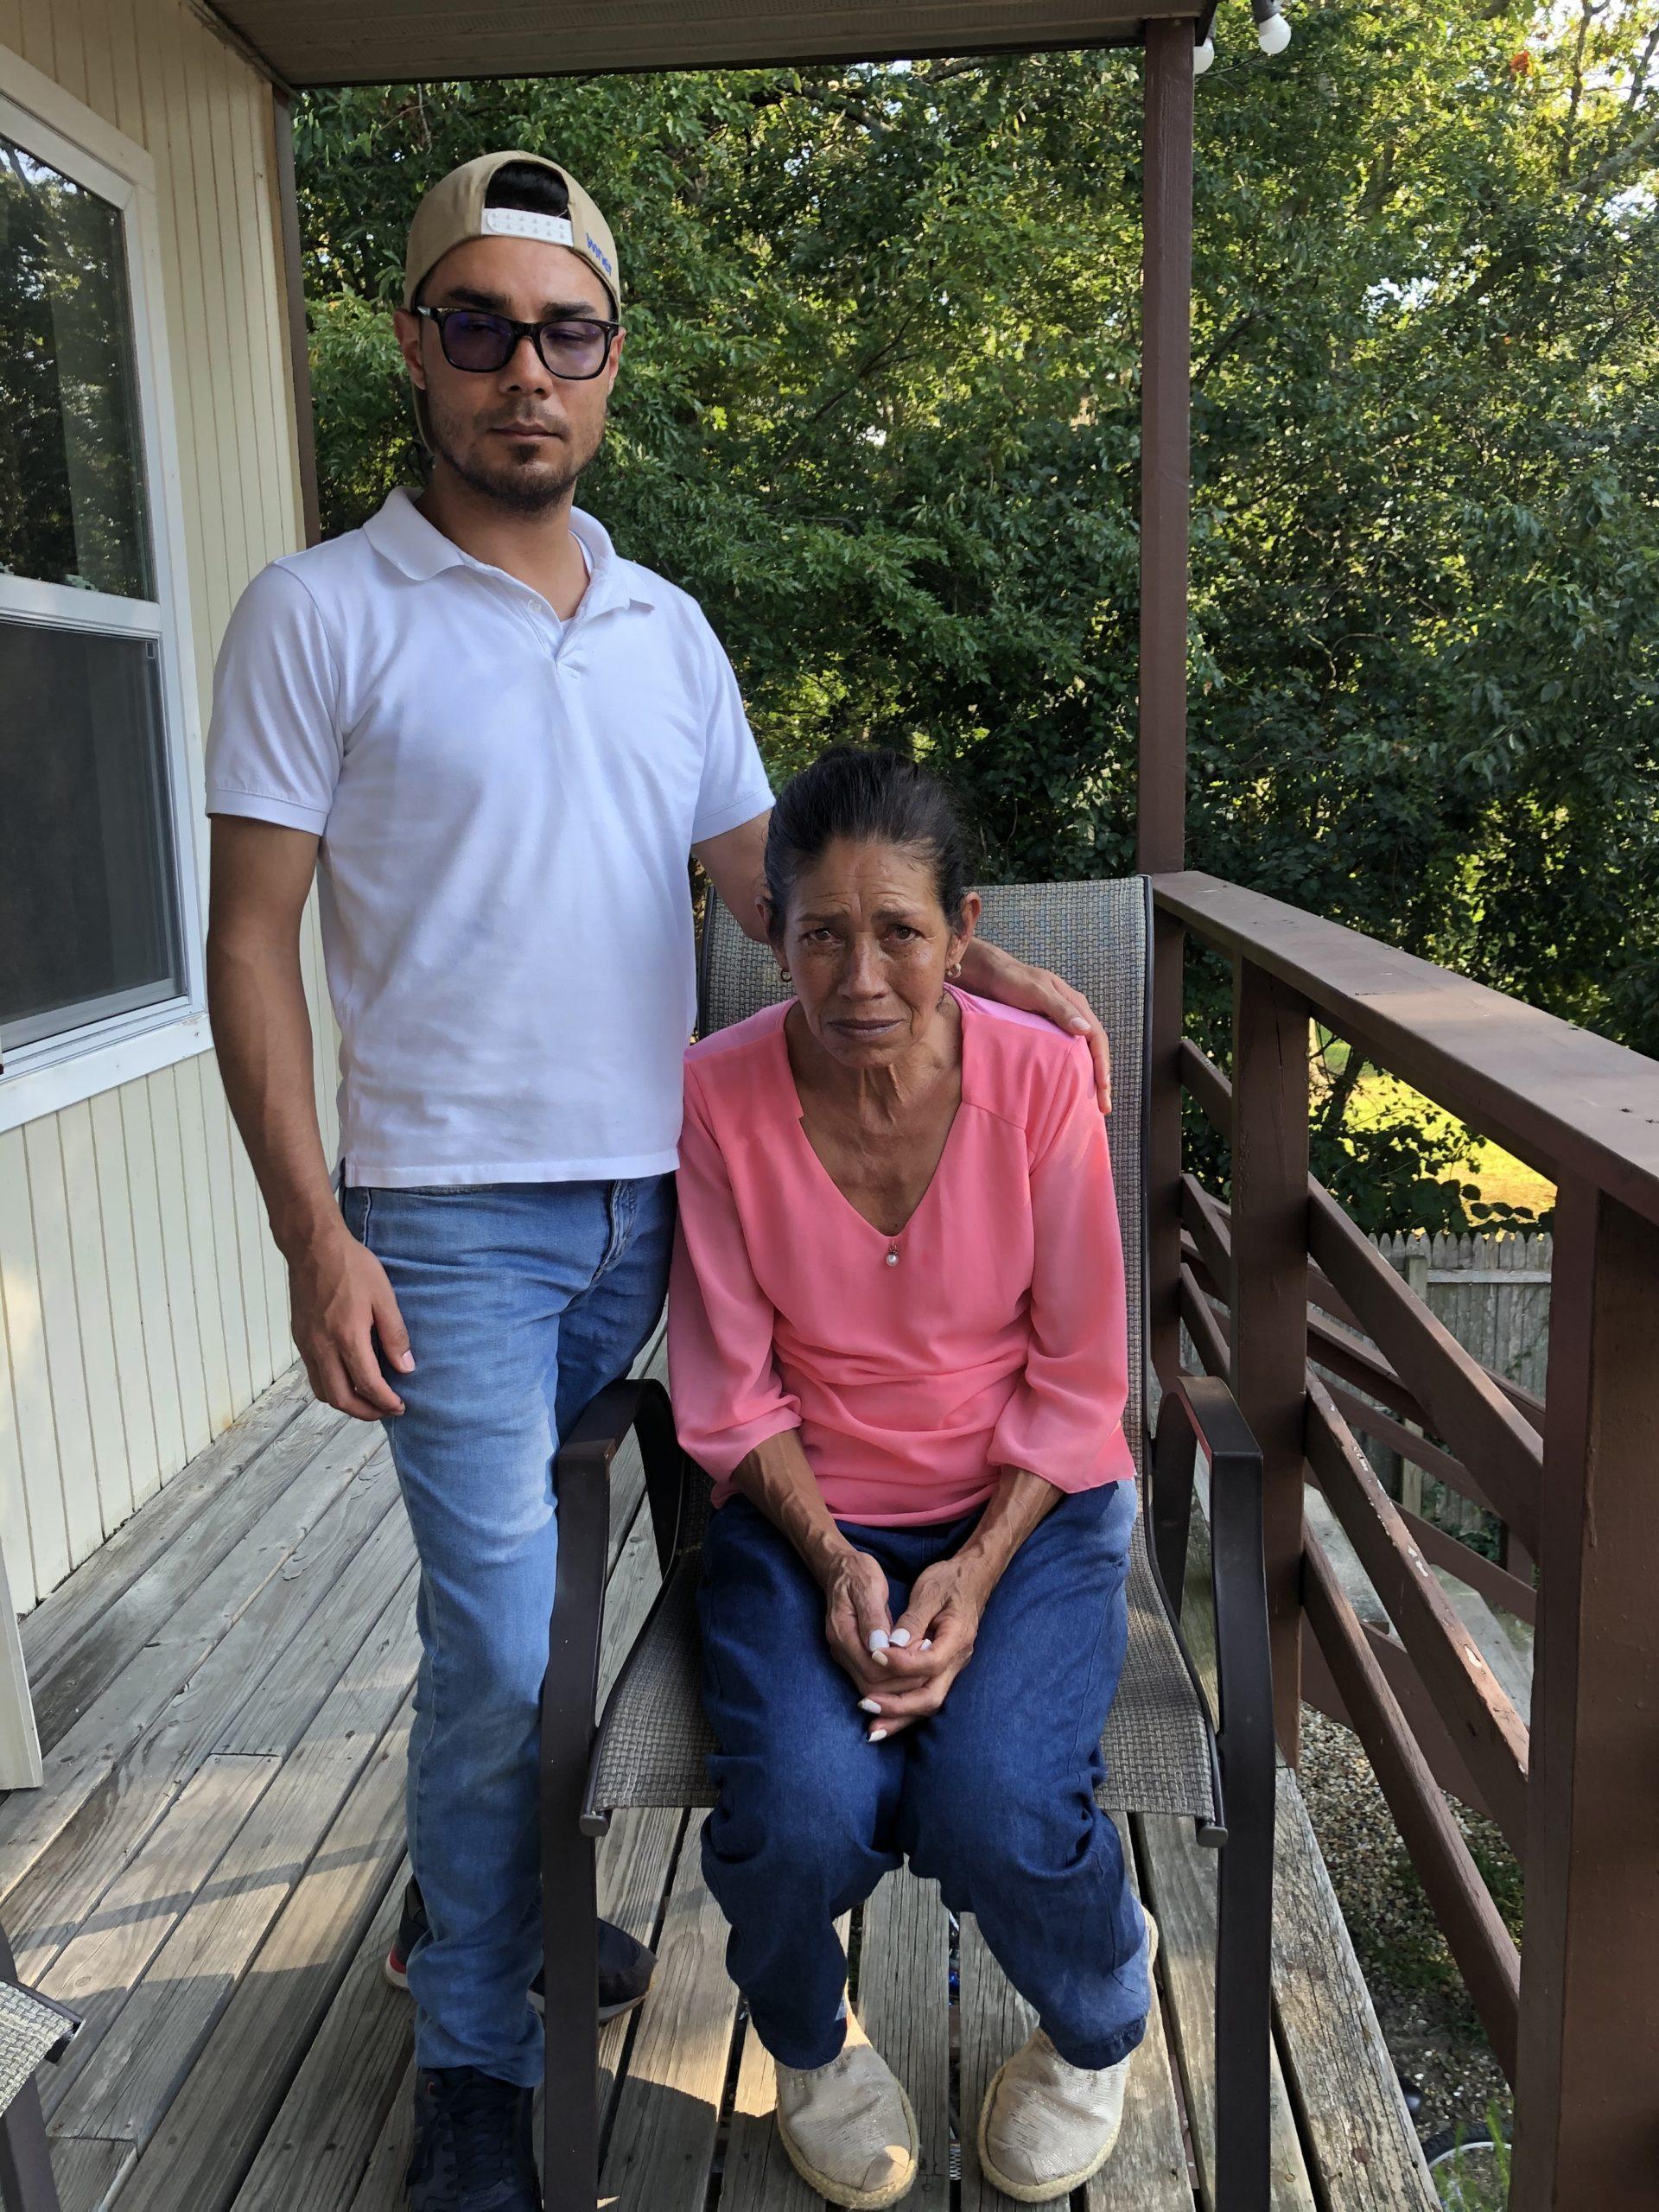 The victim's  brother, Fredy Usma Quintero, and mother, Miryam Quintero Duque. T.E. MCMORROW